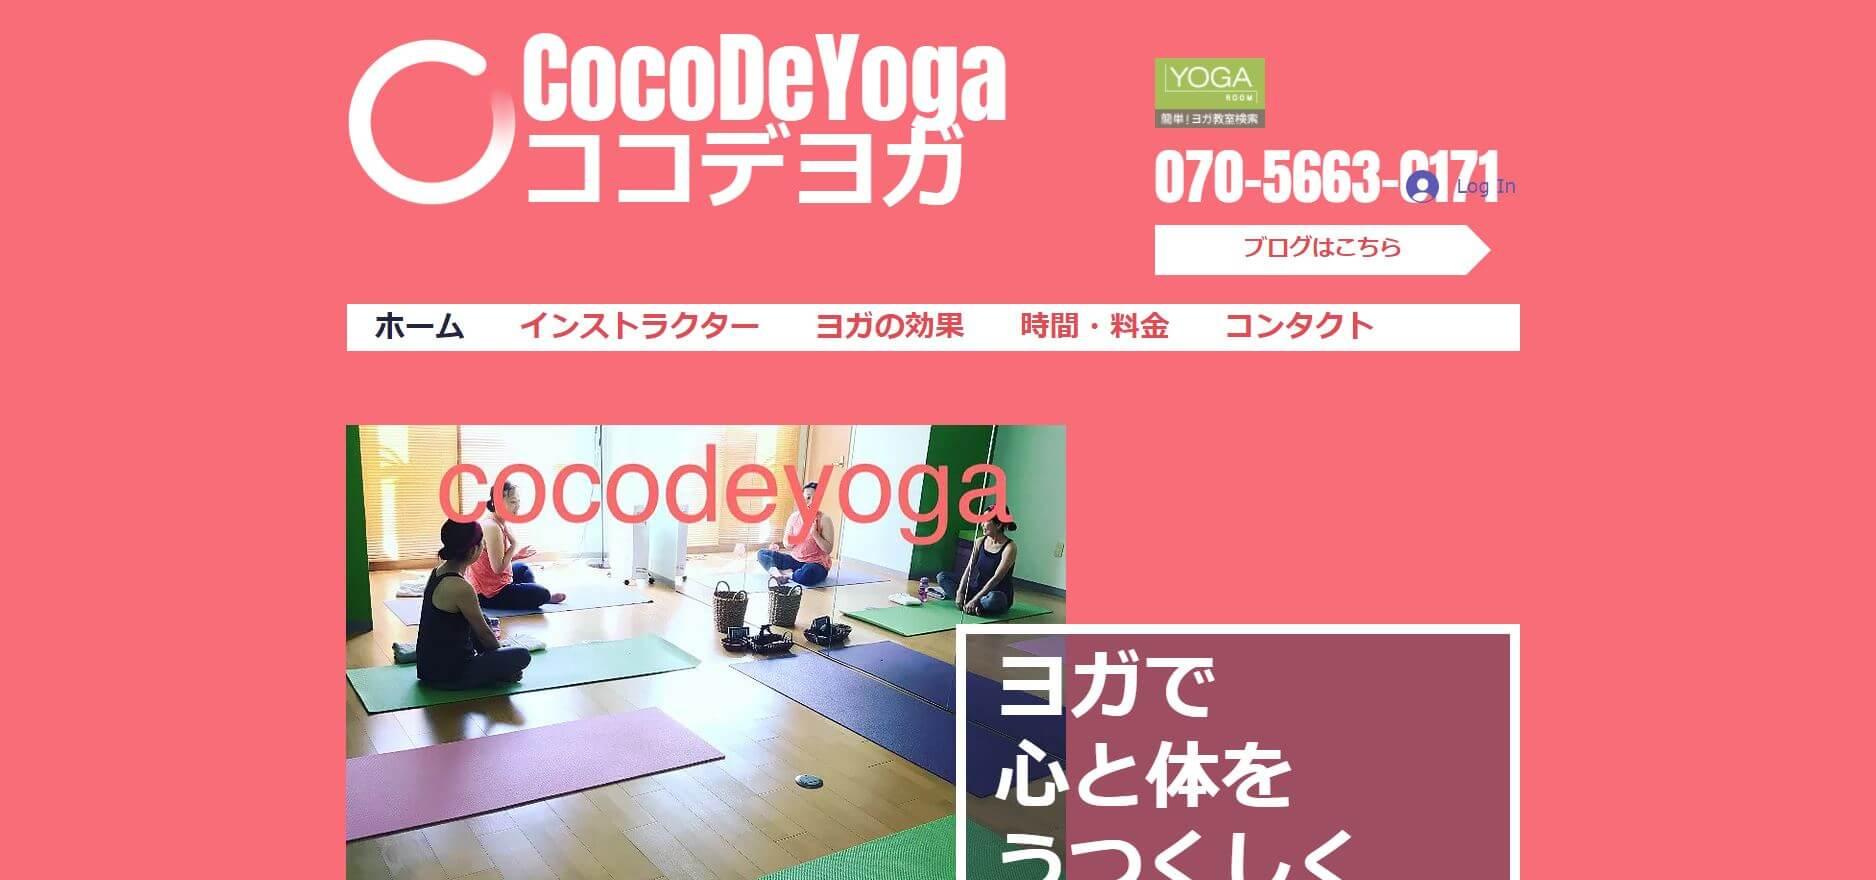 CocoDeYoga ココデヨガ